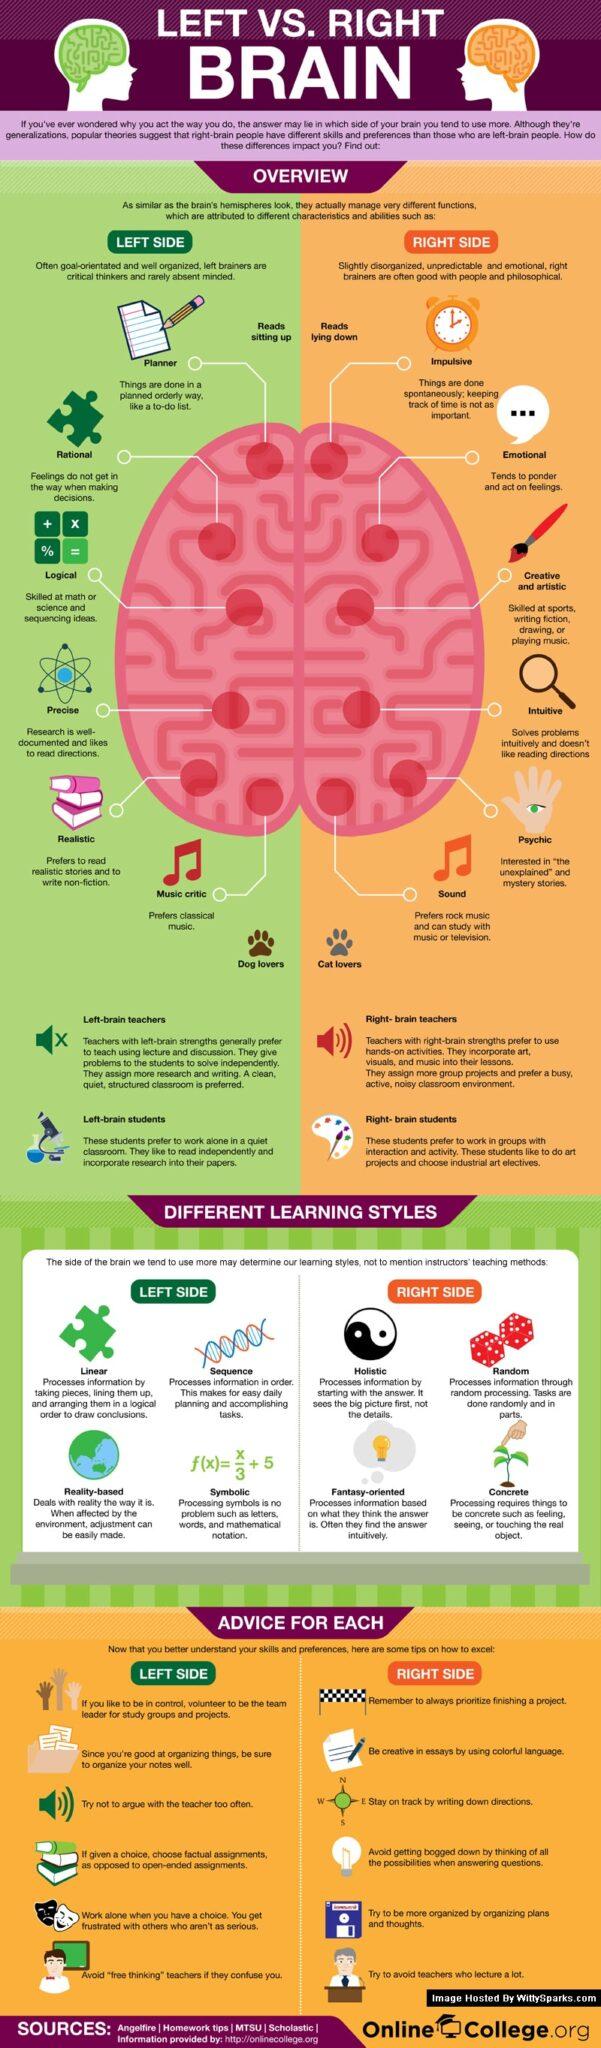 Left Brain vs. Right Brain Learners